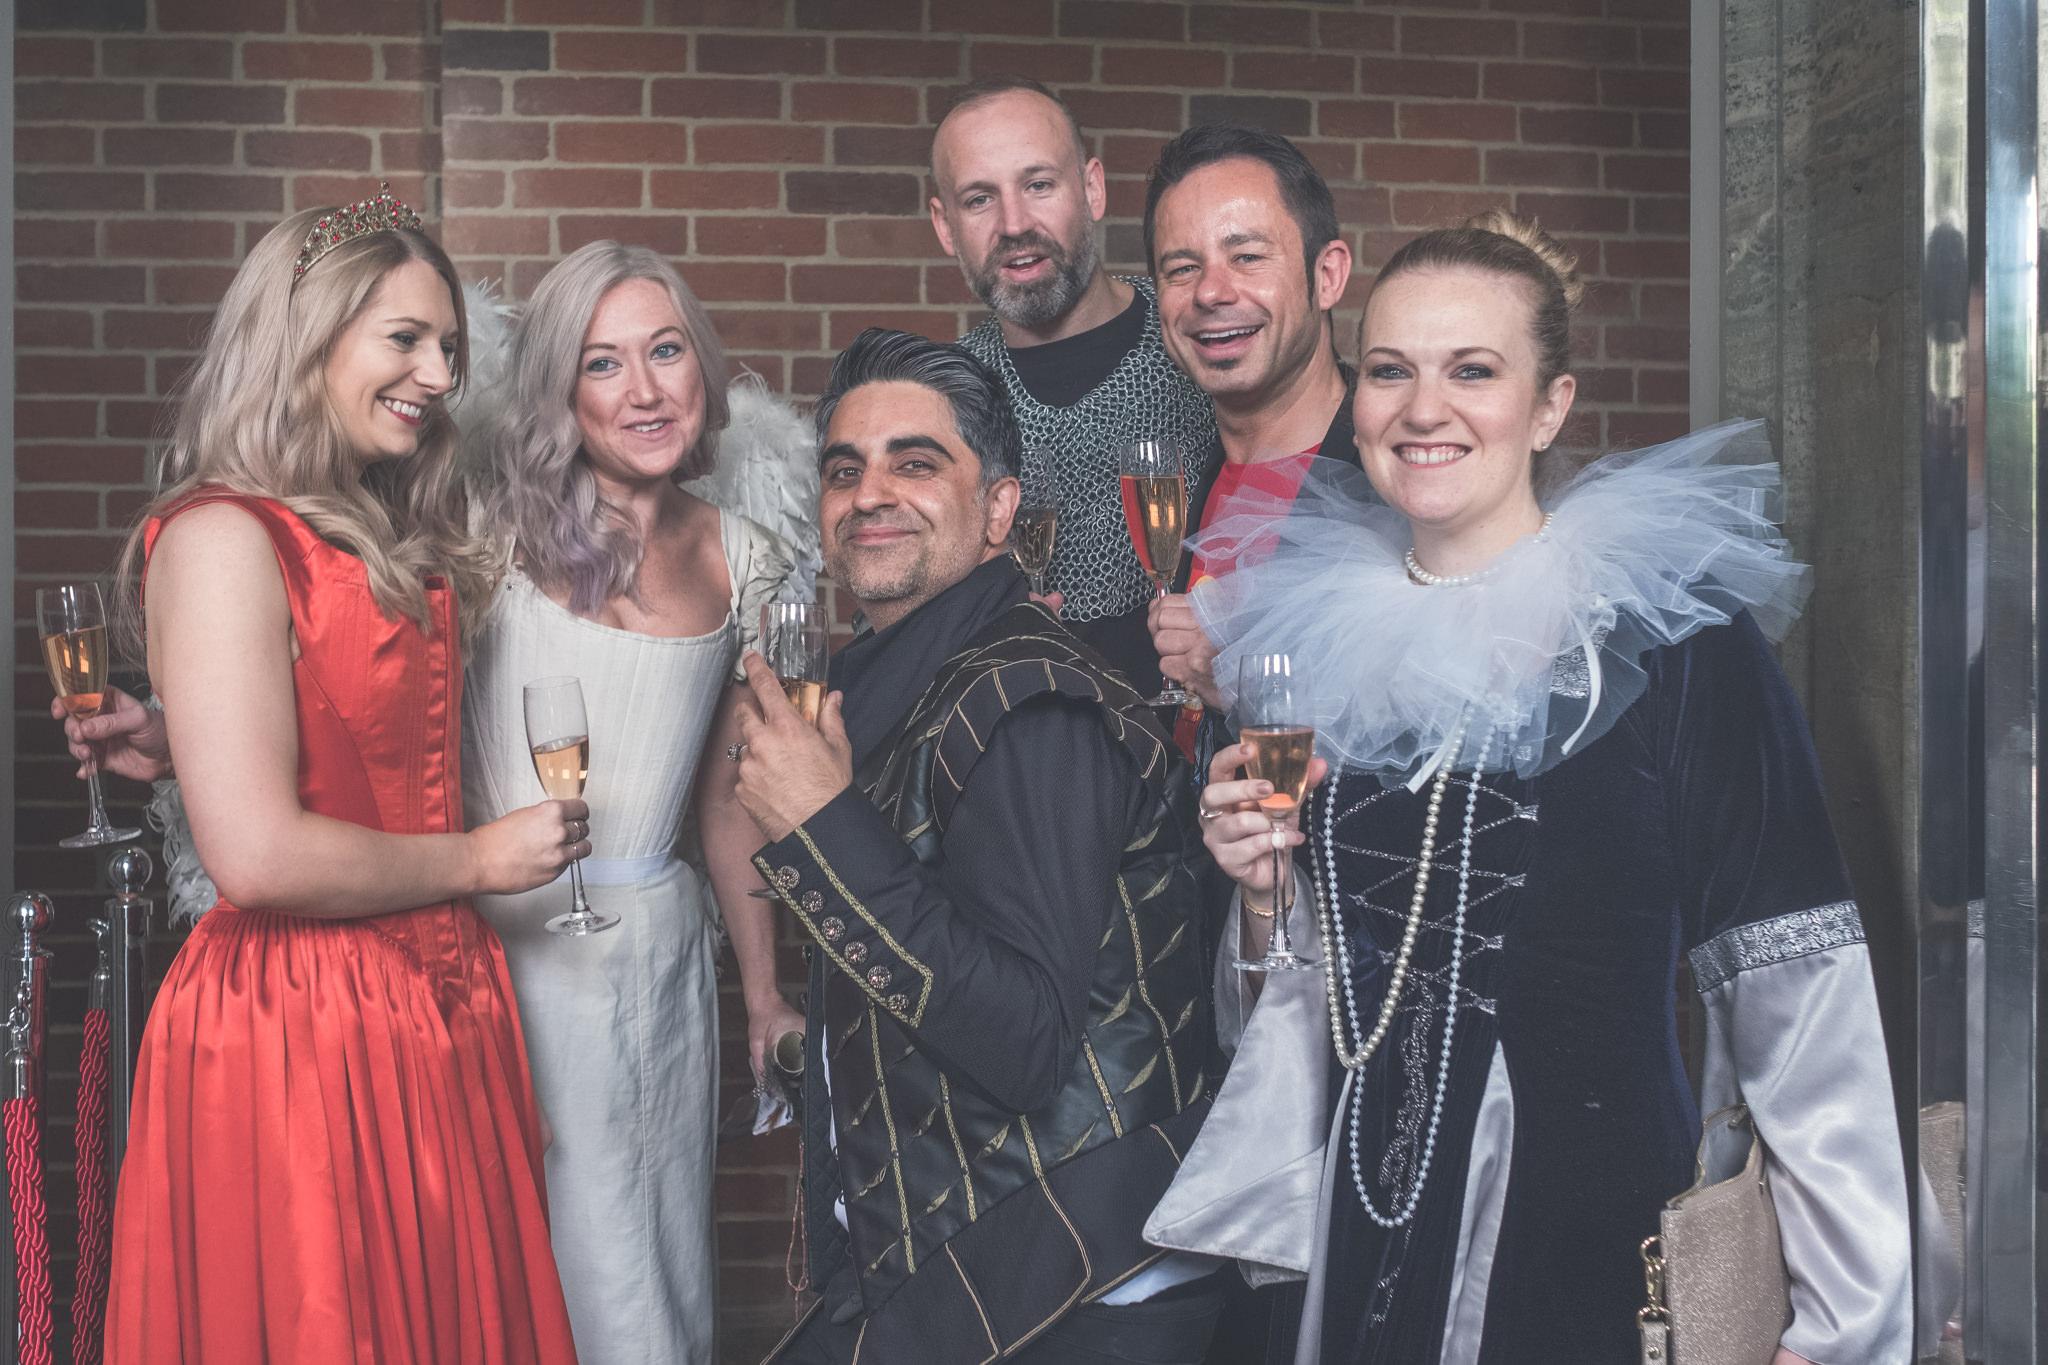 Stratford-Upon-Avon-Wedding - Robin Ball Photography-33.jpg